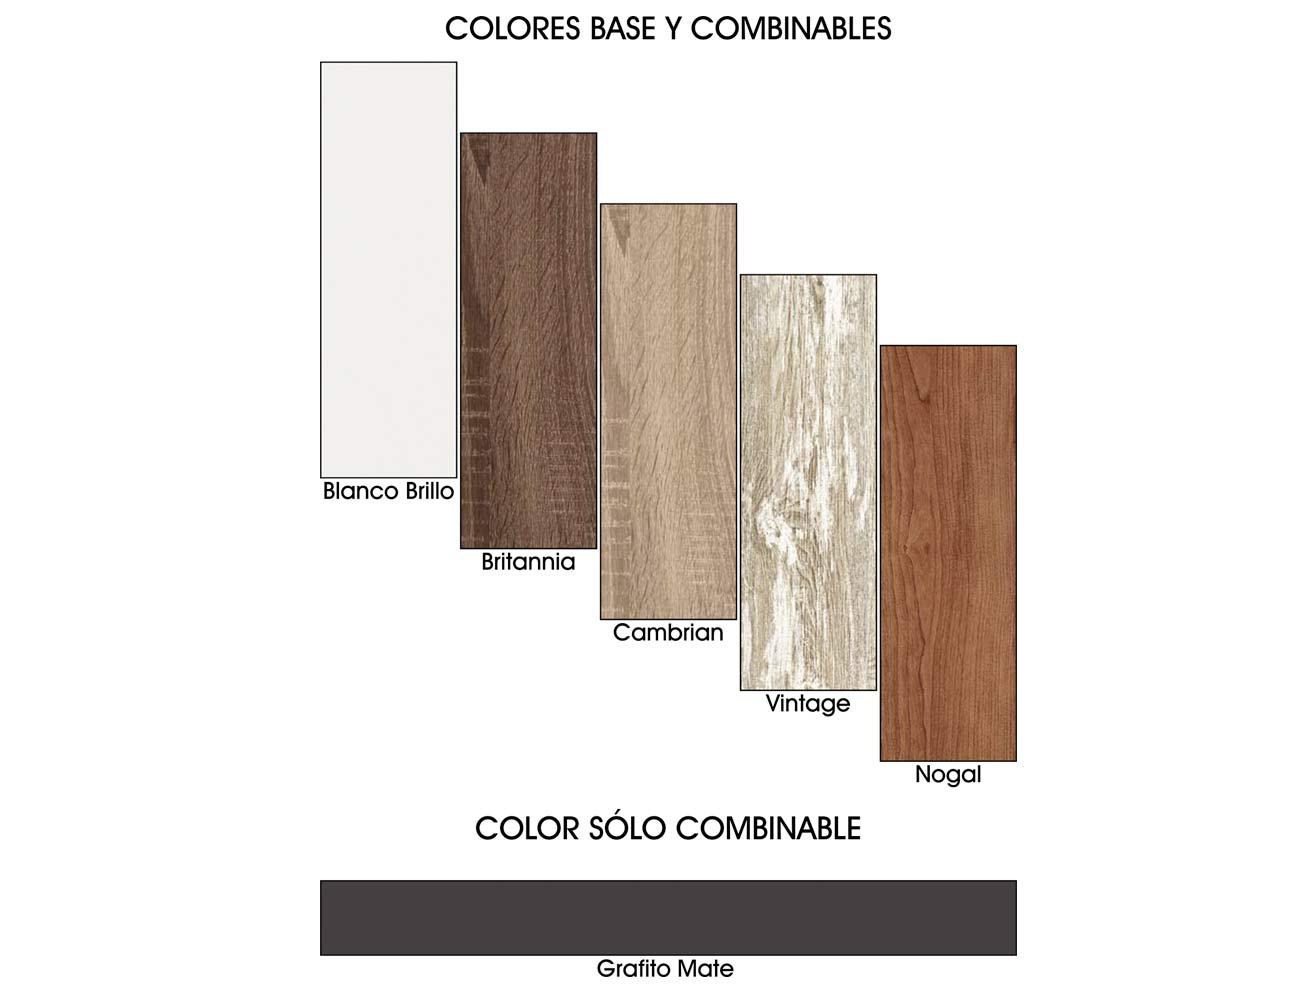 Colores25